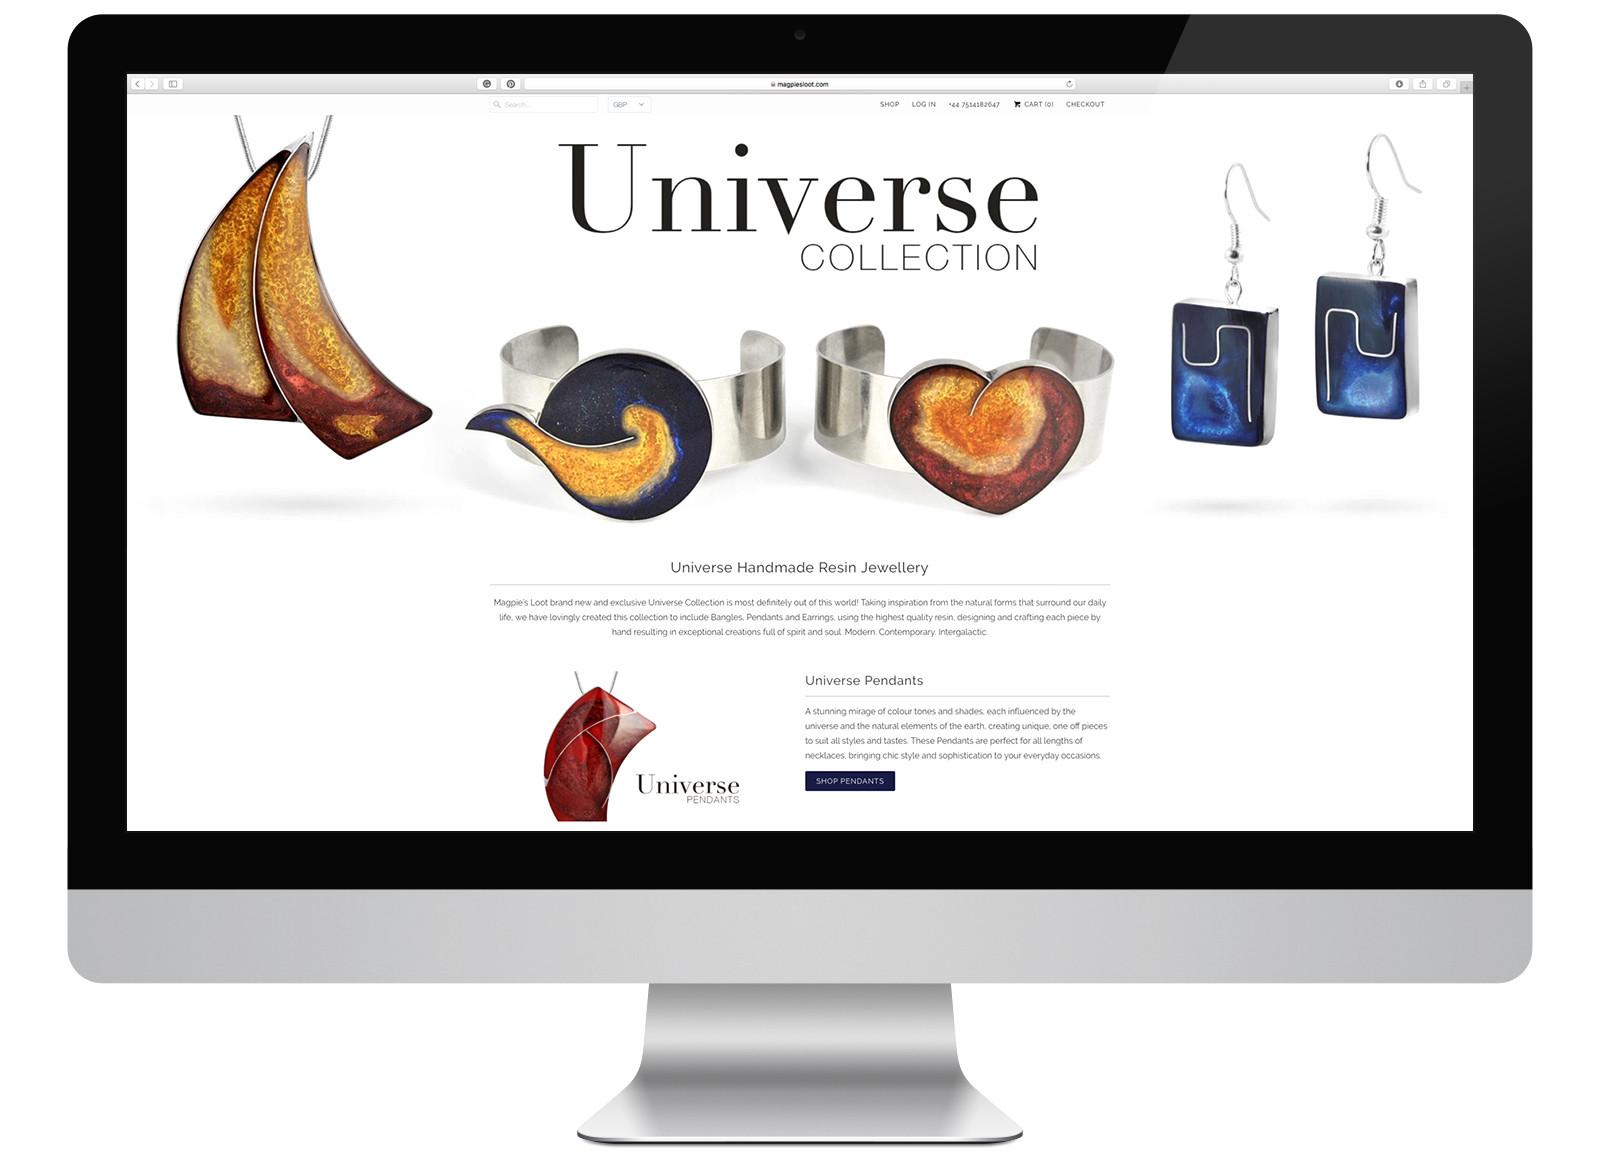 magpies-loot-webdesign-3-martin-marcin-r